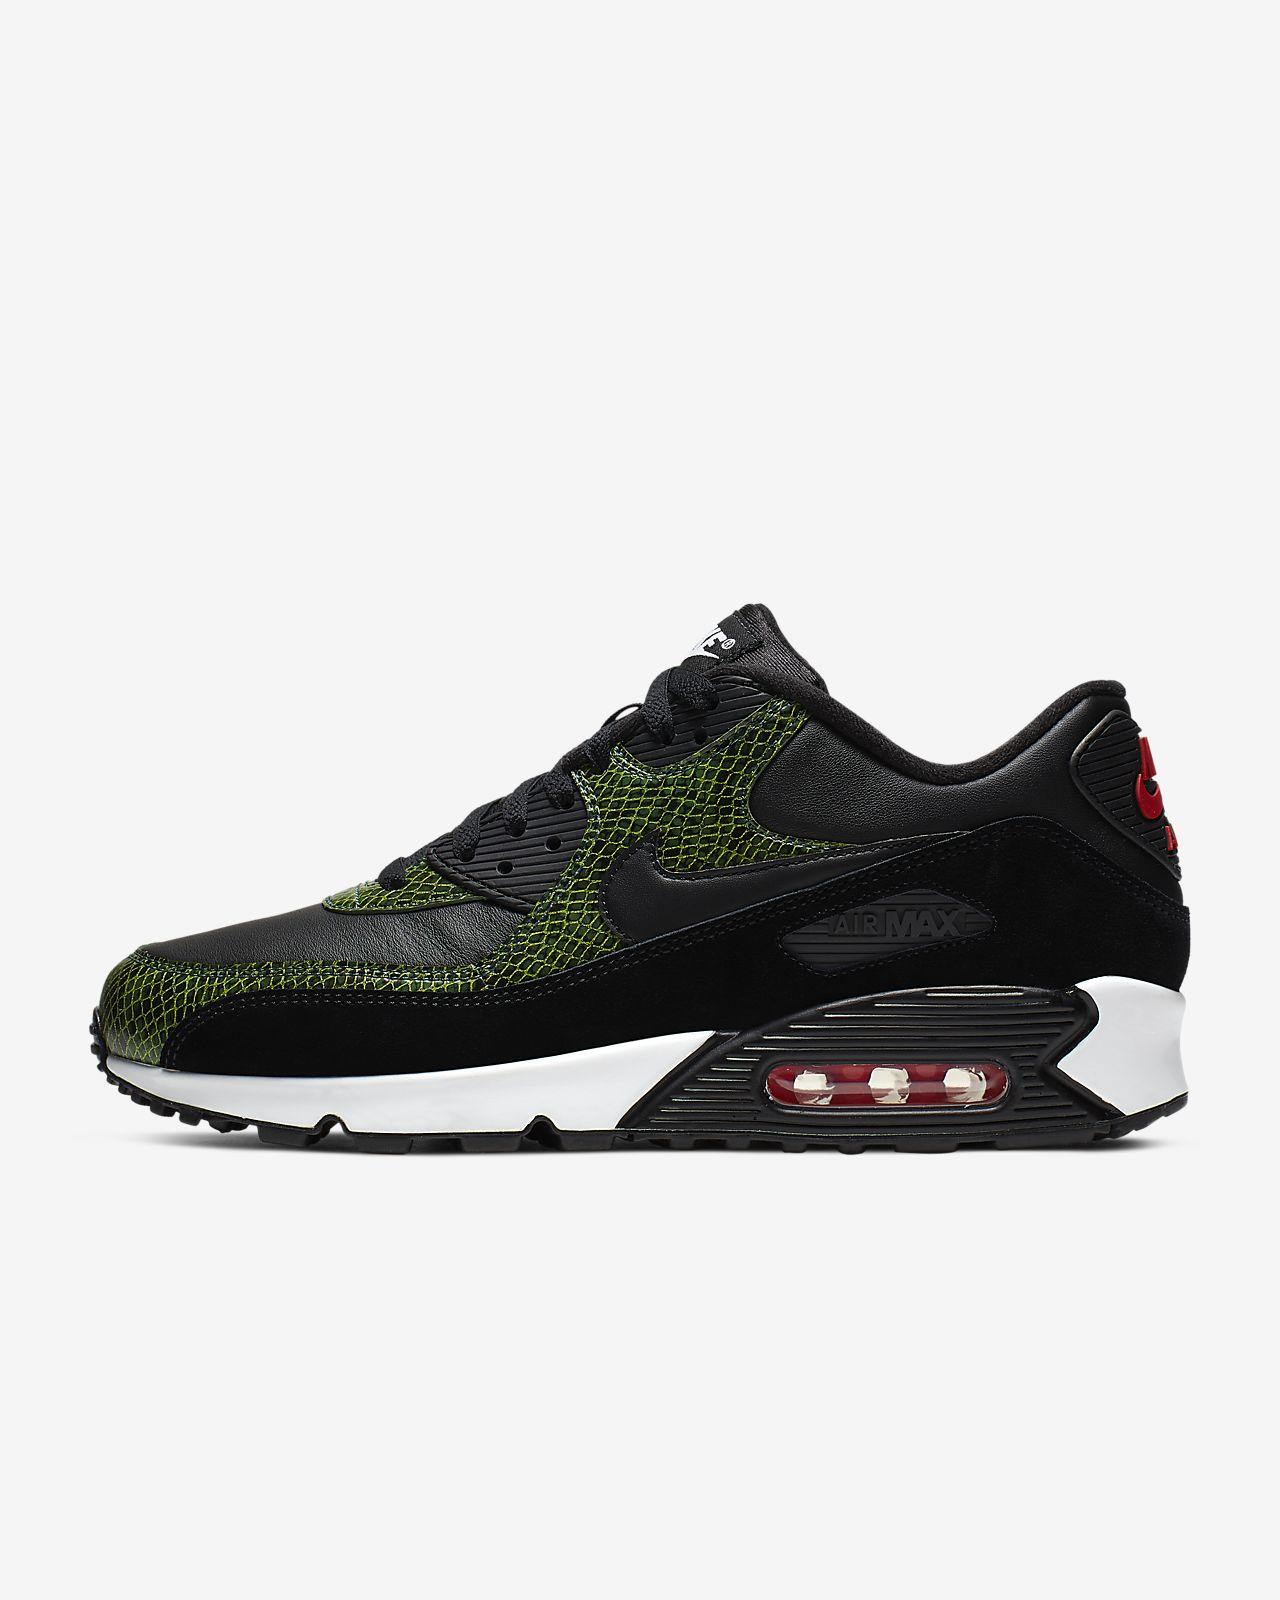 Nike Air Max 90 QS 男子运动鞋